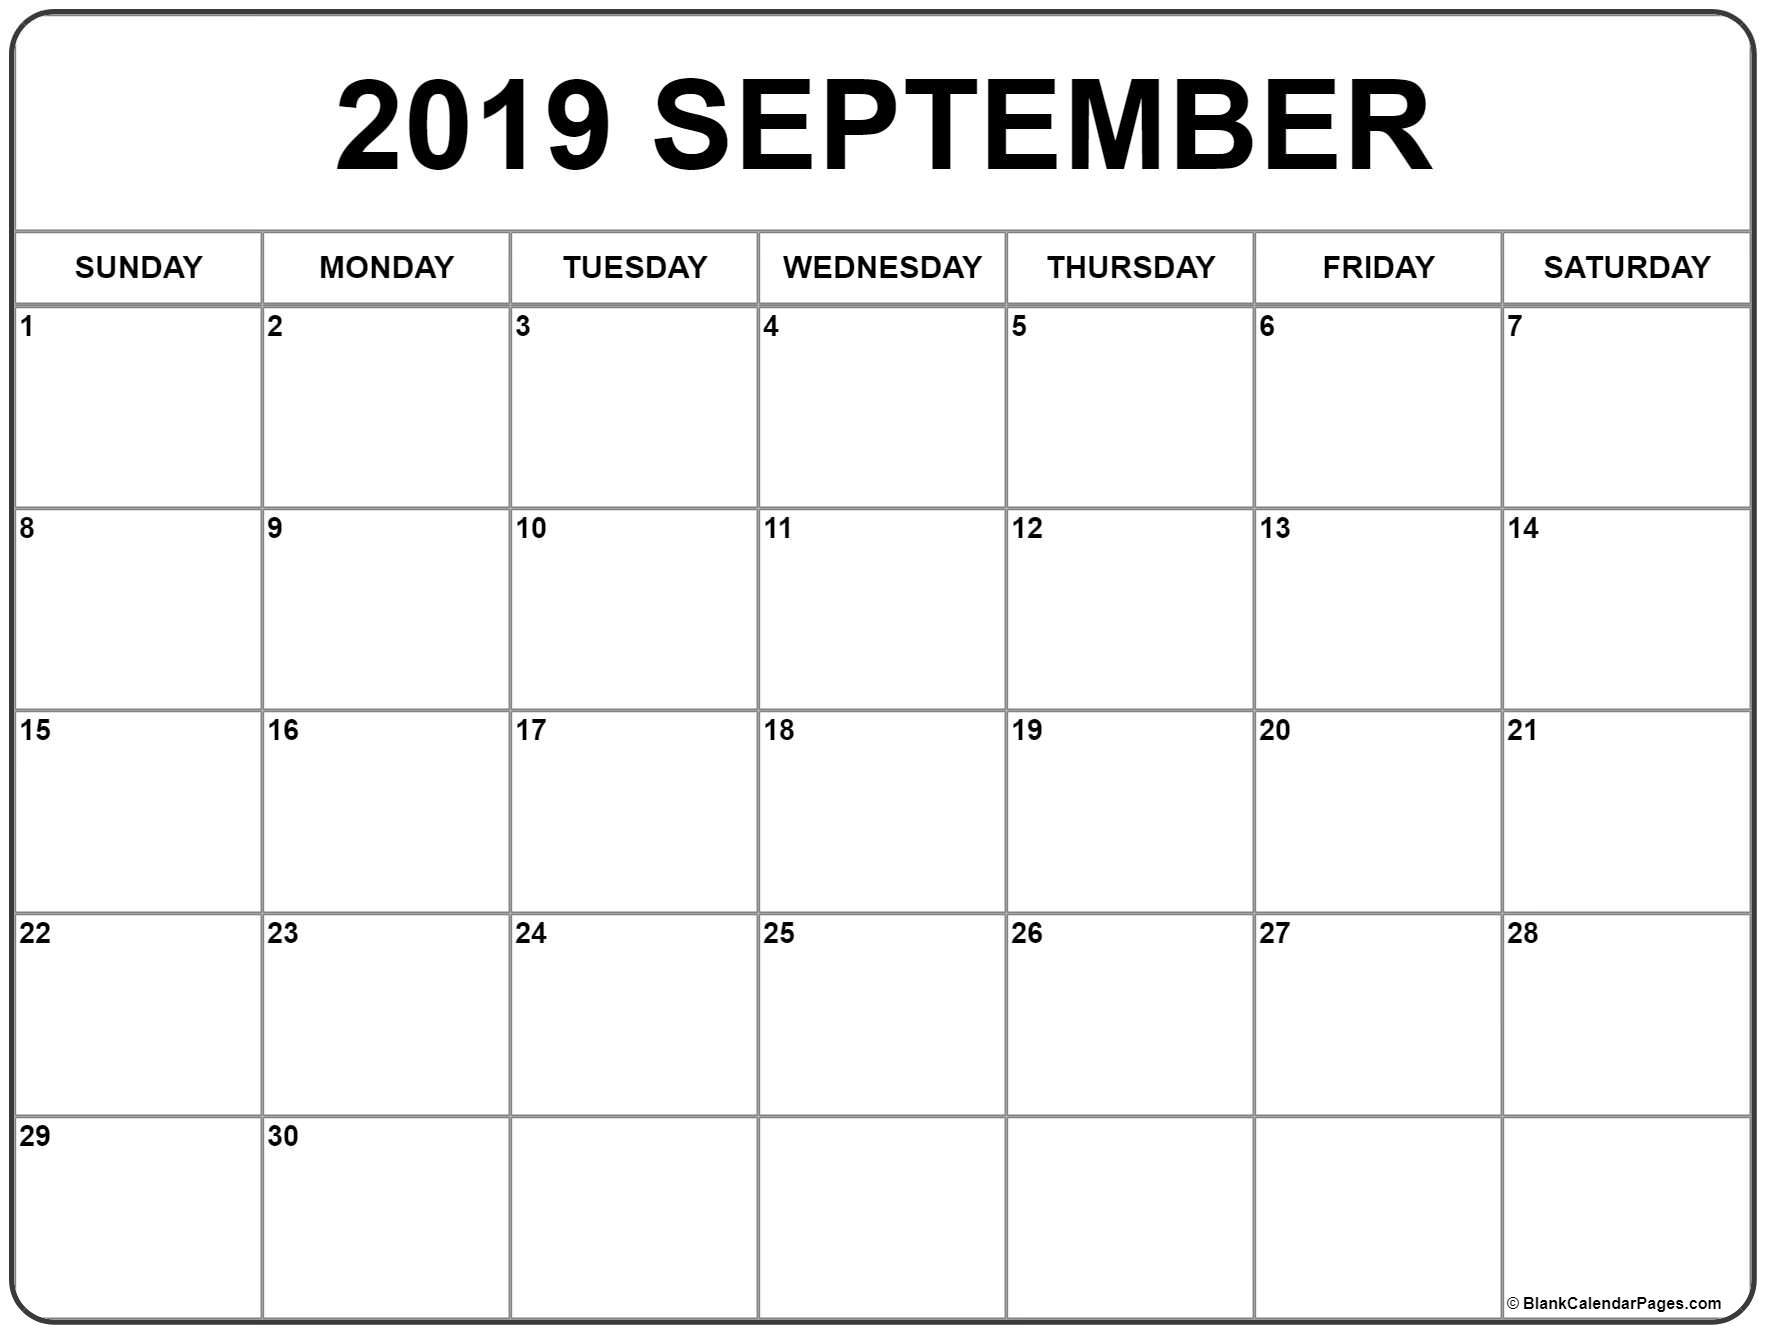 September 2019 Calendar   Free Printable Monthly Calendars regarding Blank Monthly Calendar September